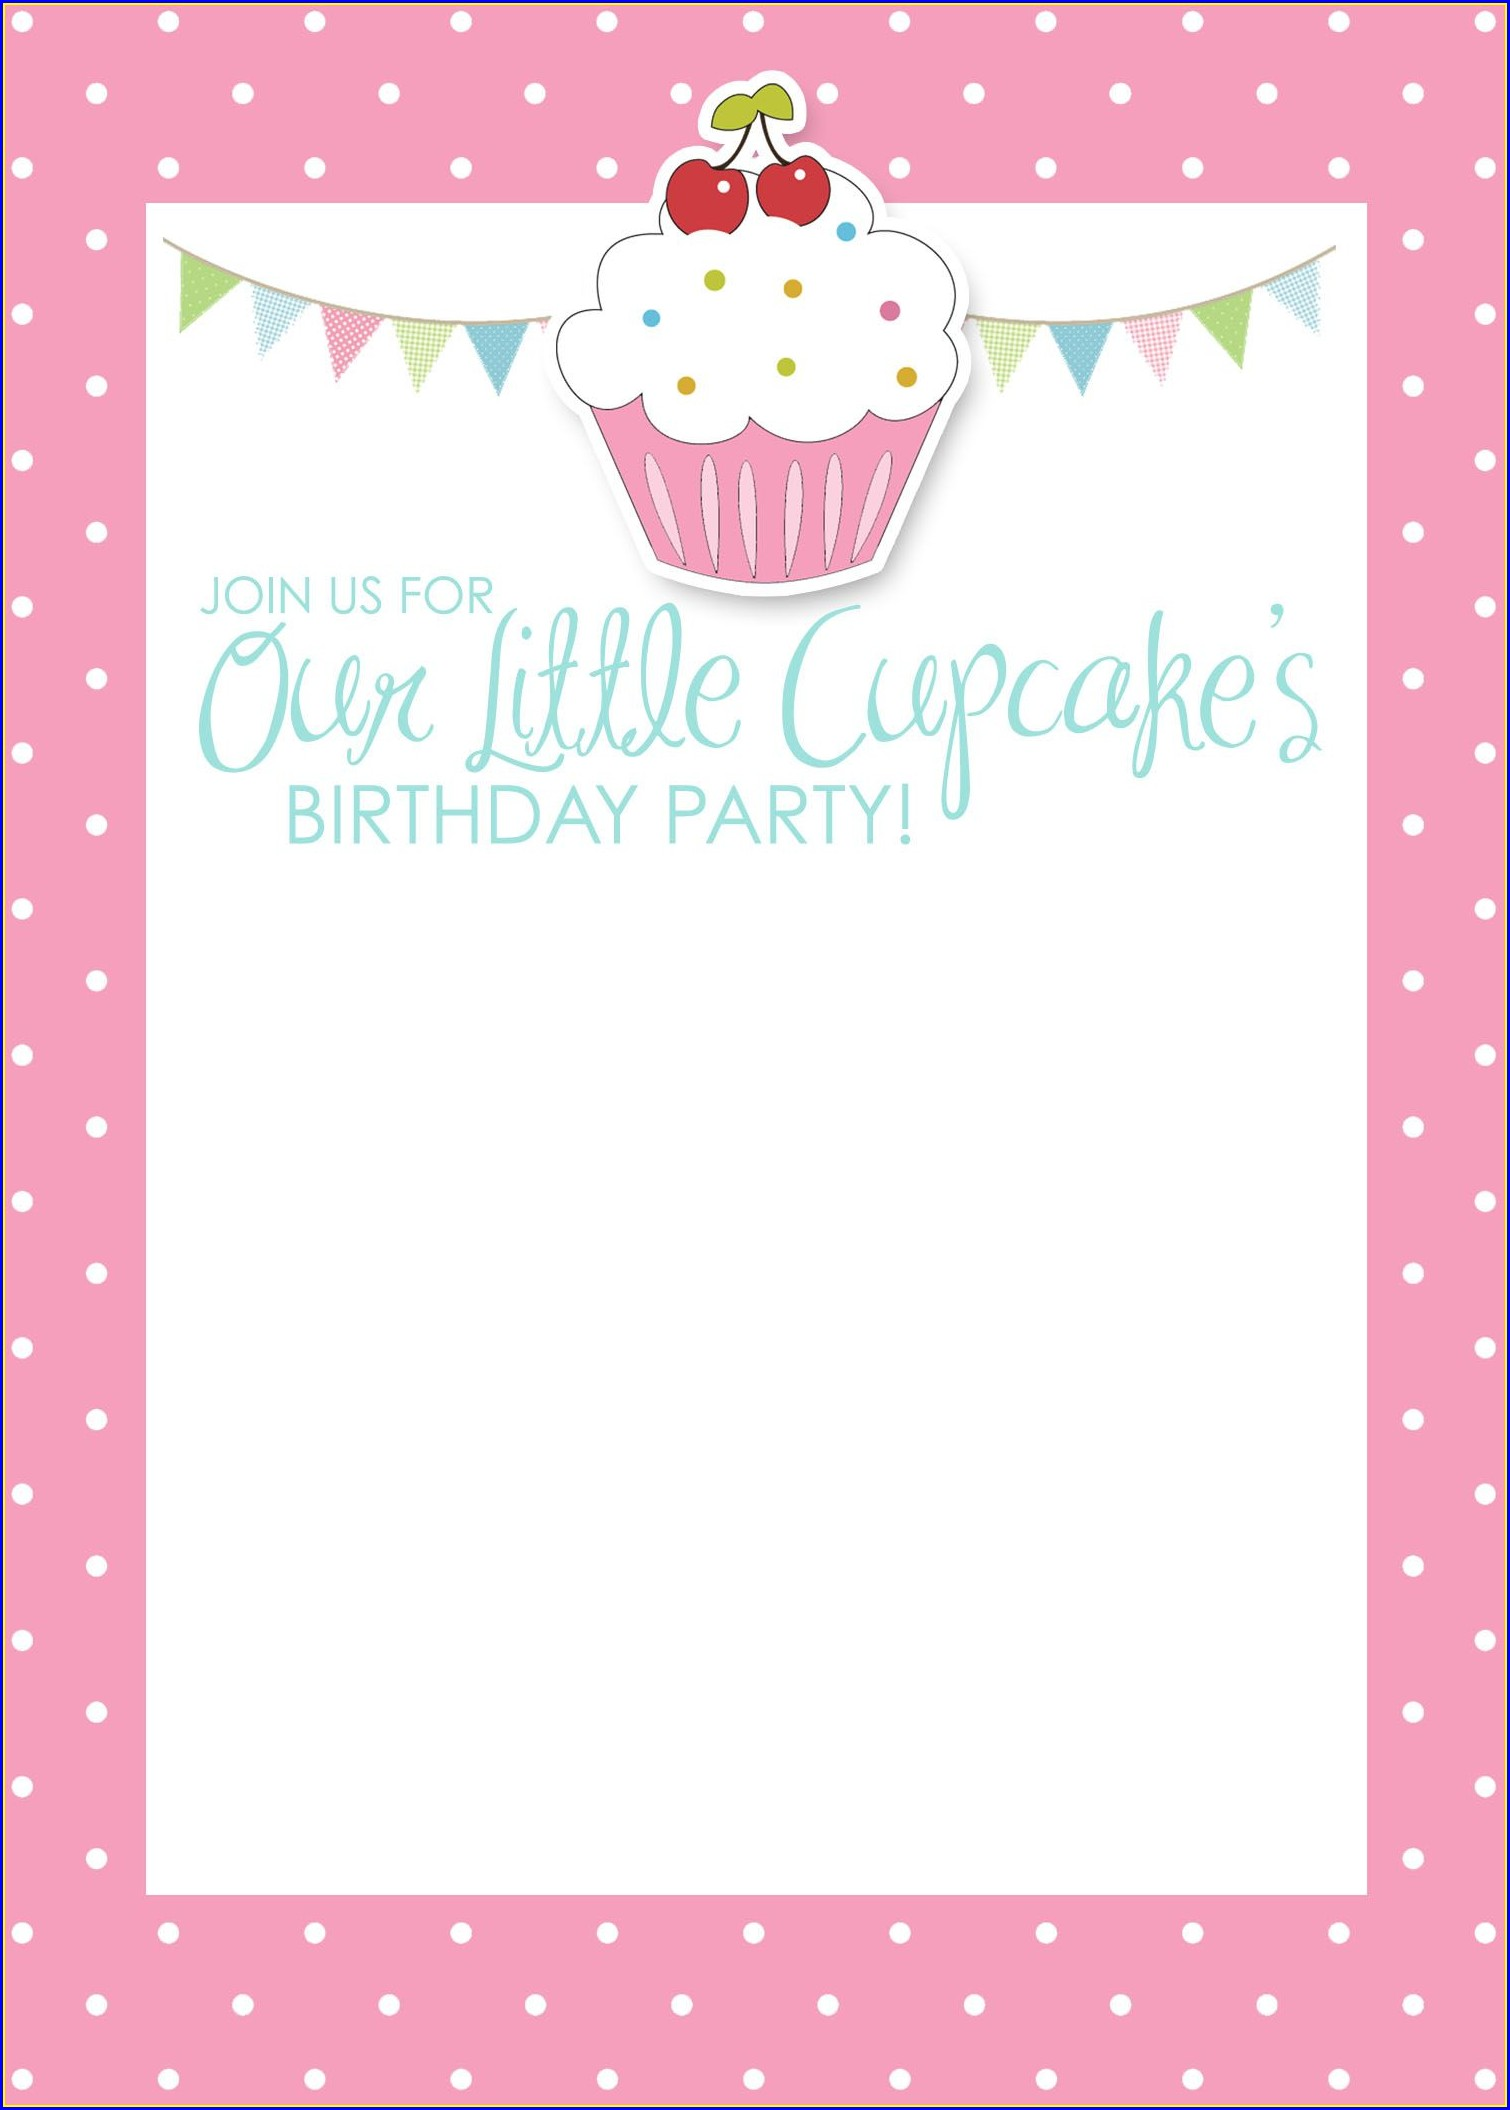 Birthday Invitation Card Template Free